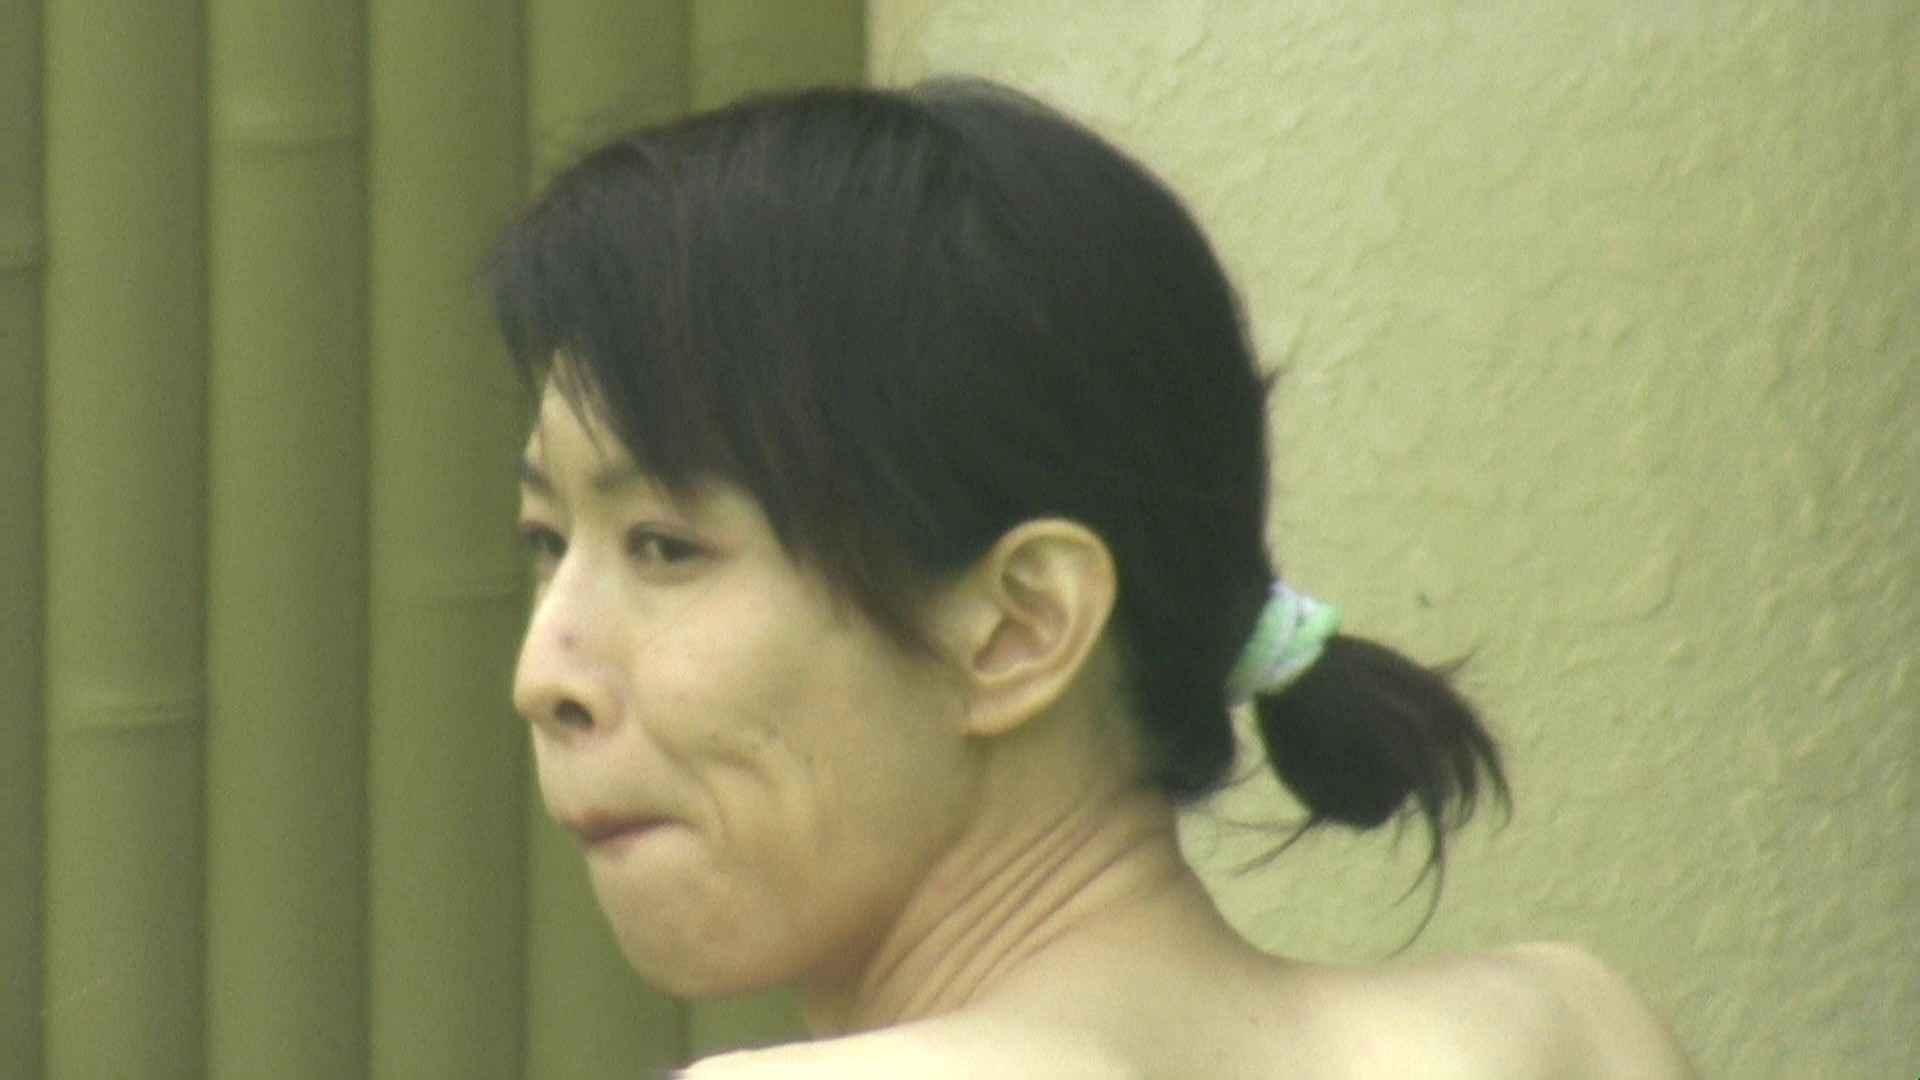 Aquaな露天風呂Vol.631 盗撮  109連発 73